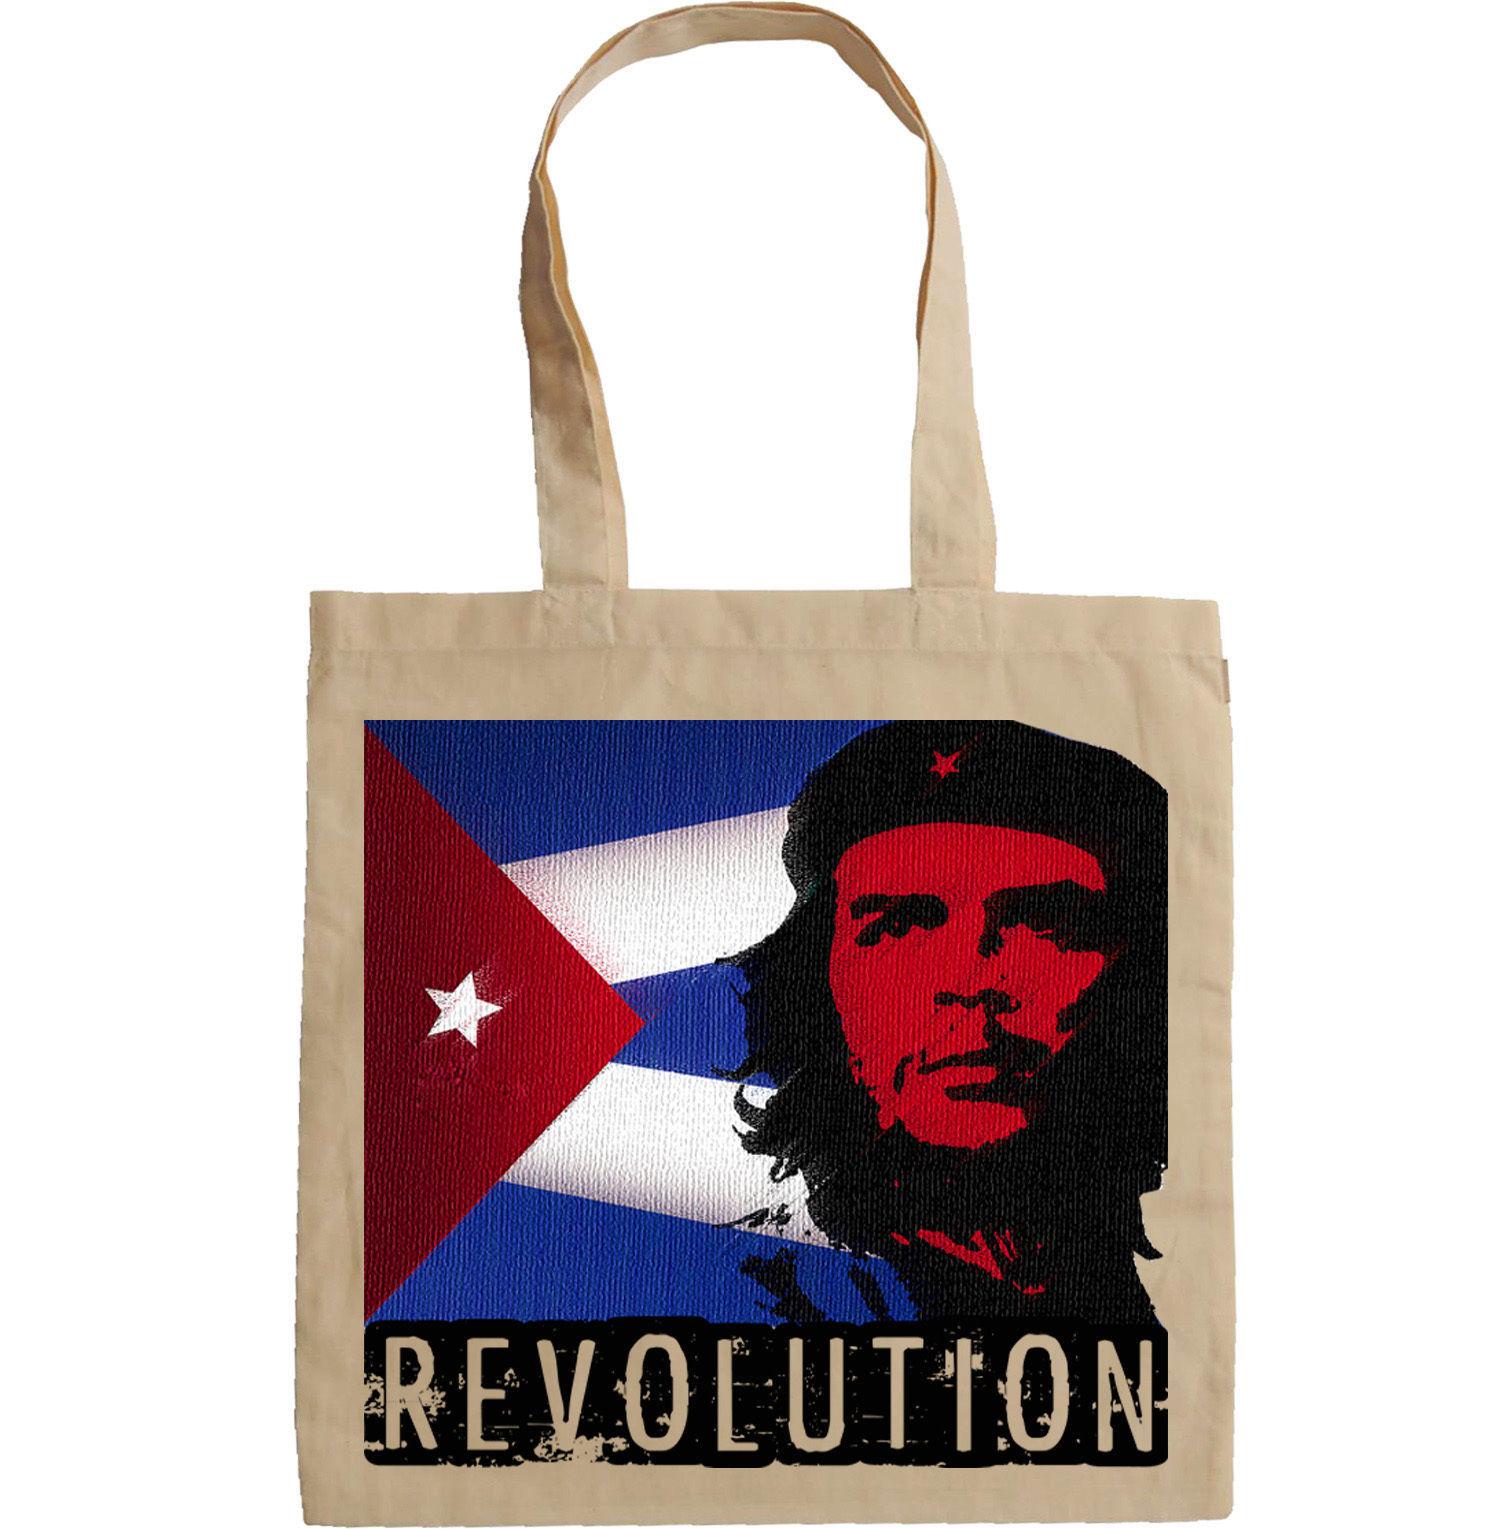 CHE GUEVARA CUBAN REVOLUTION - NEW AMAZING GRAPHIC HAND BAG/TOTE BAG